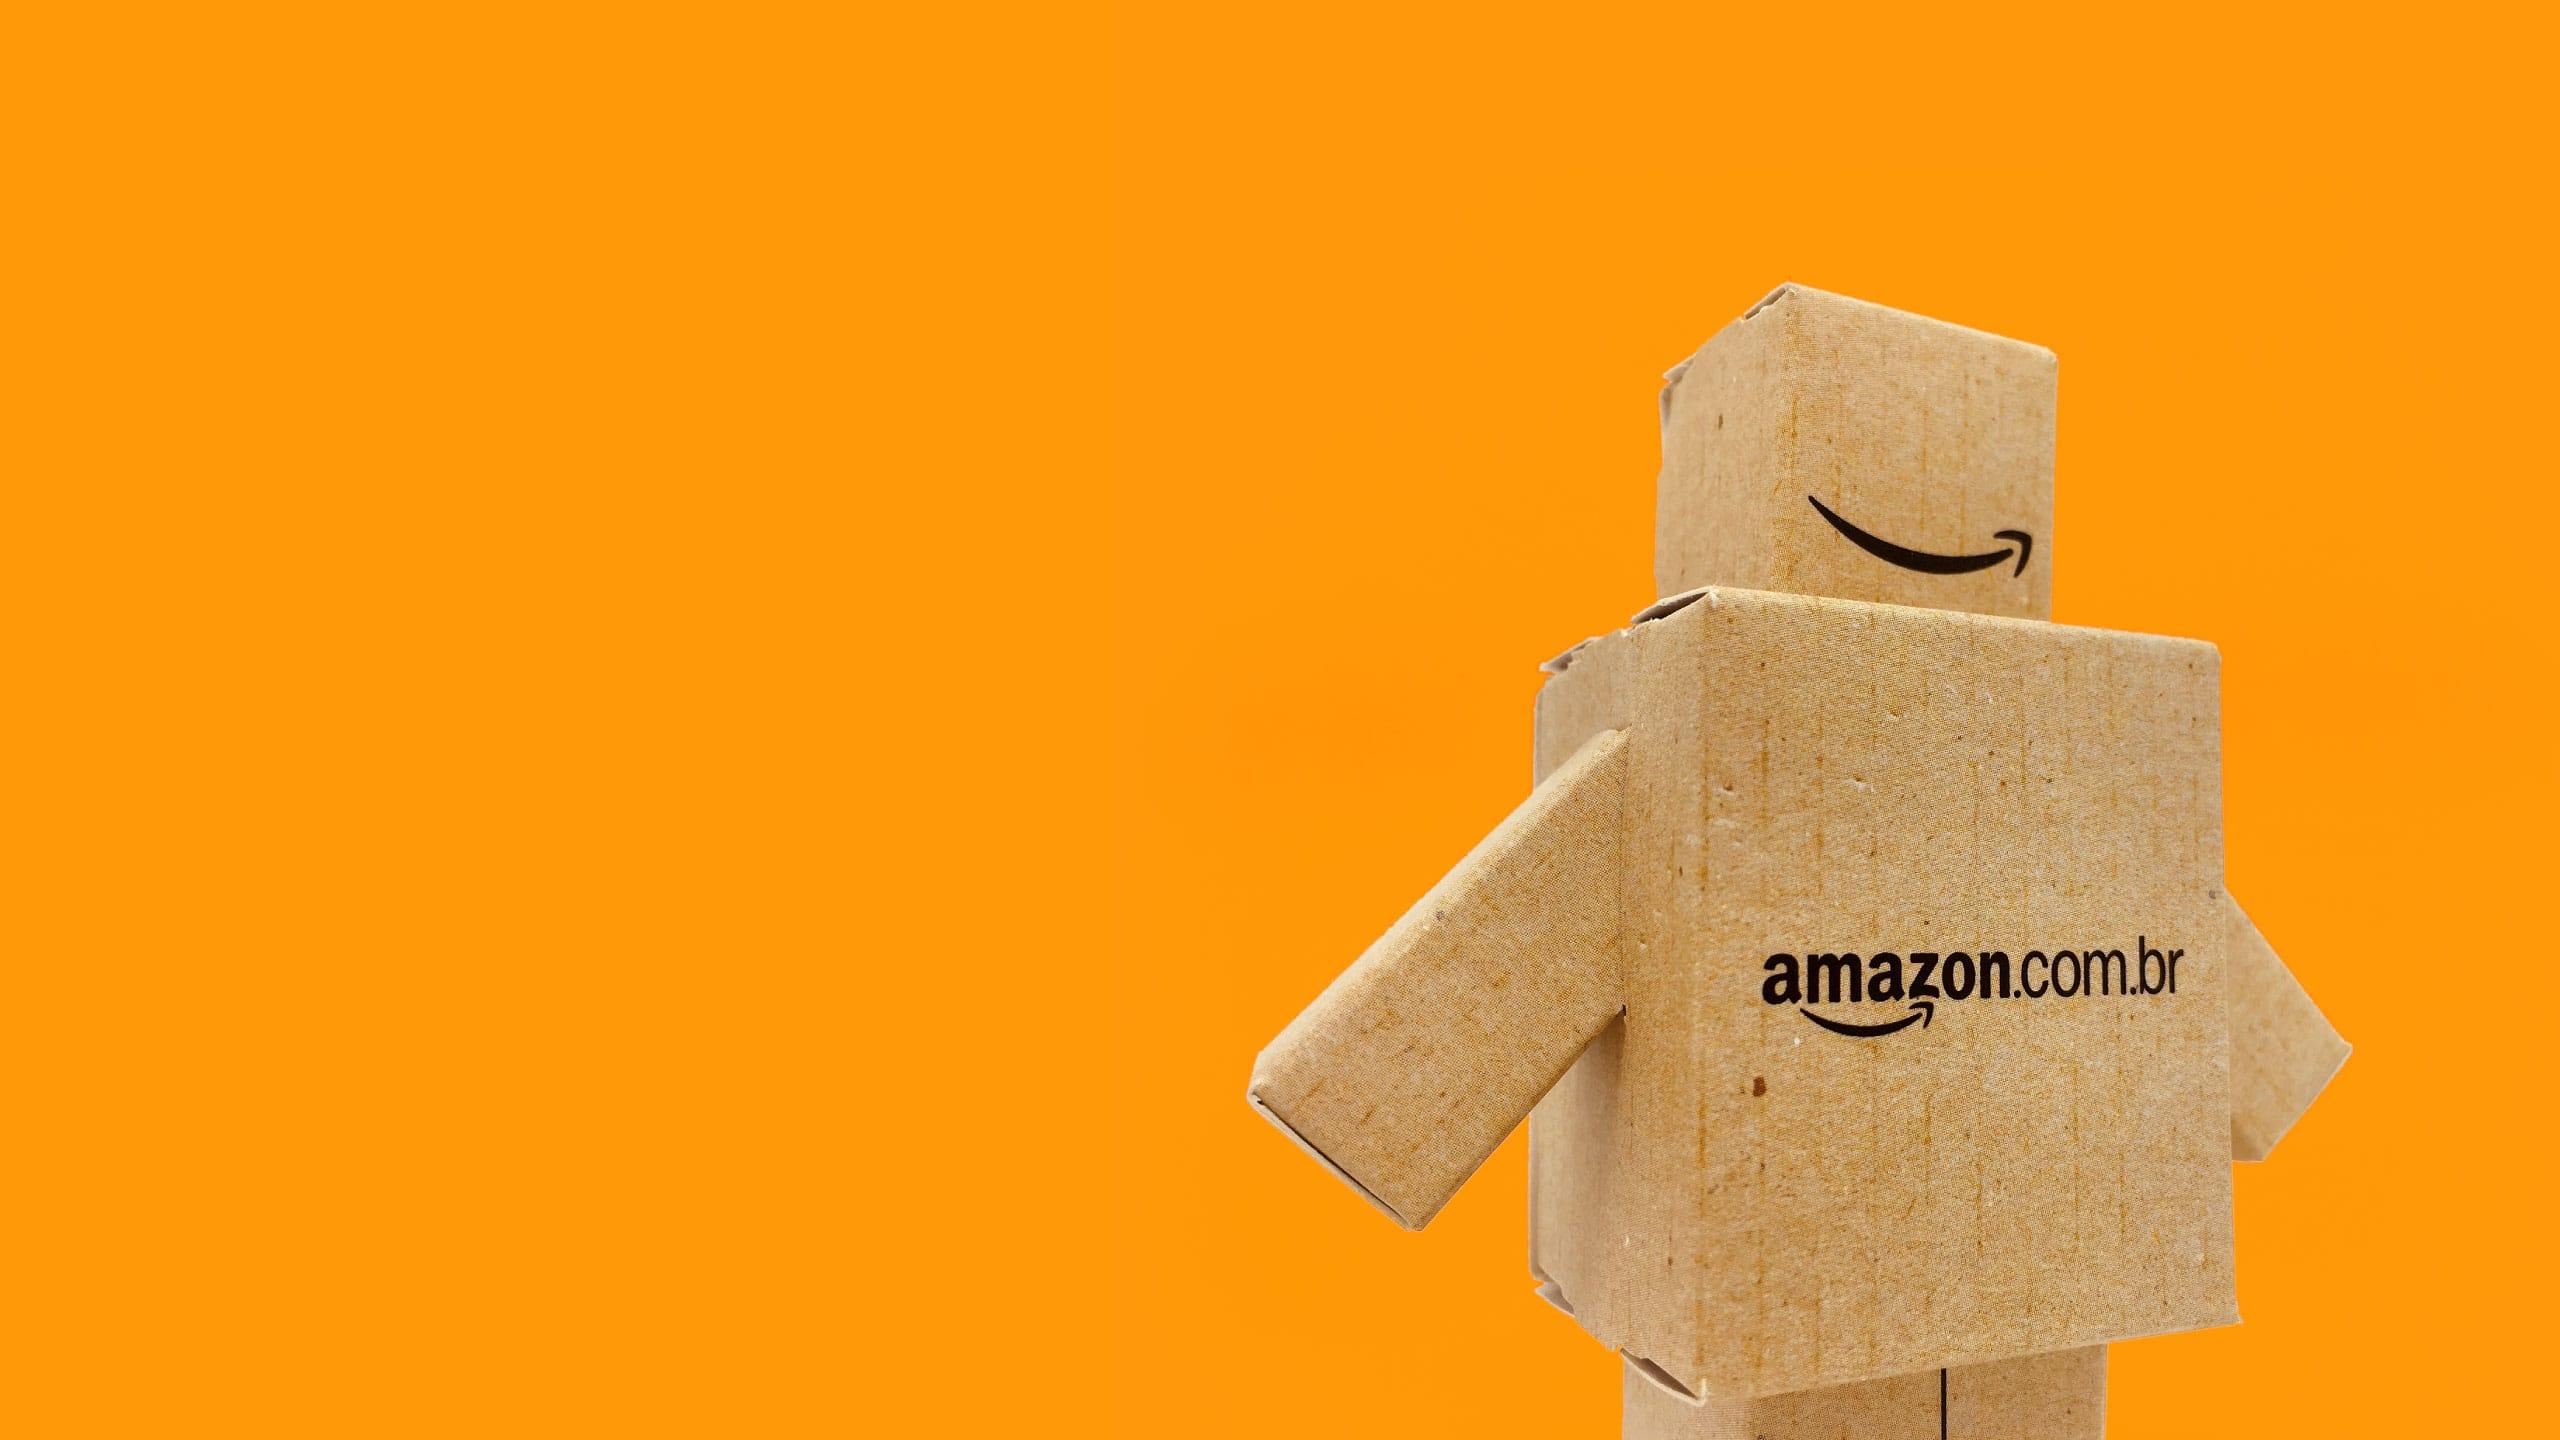 Nav580 - Amazon Boxy